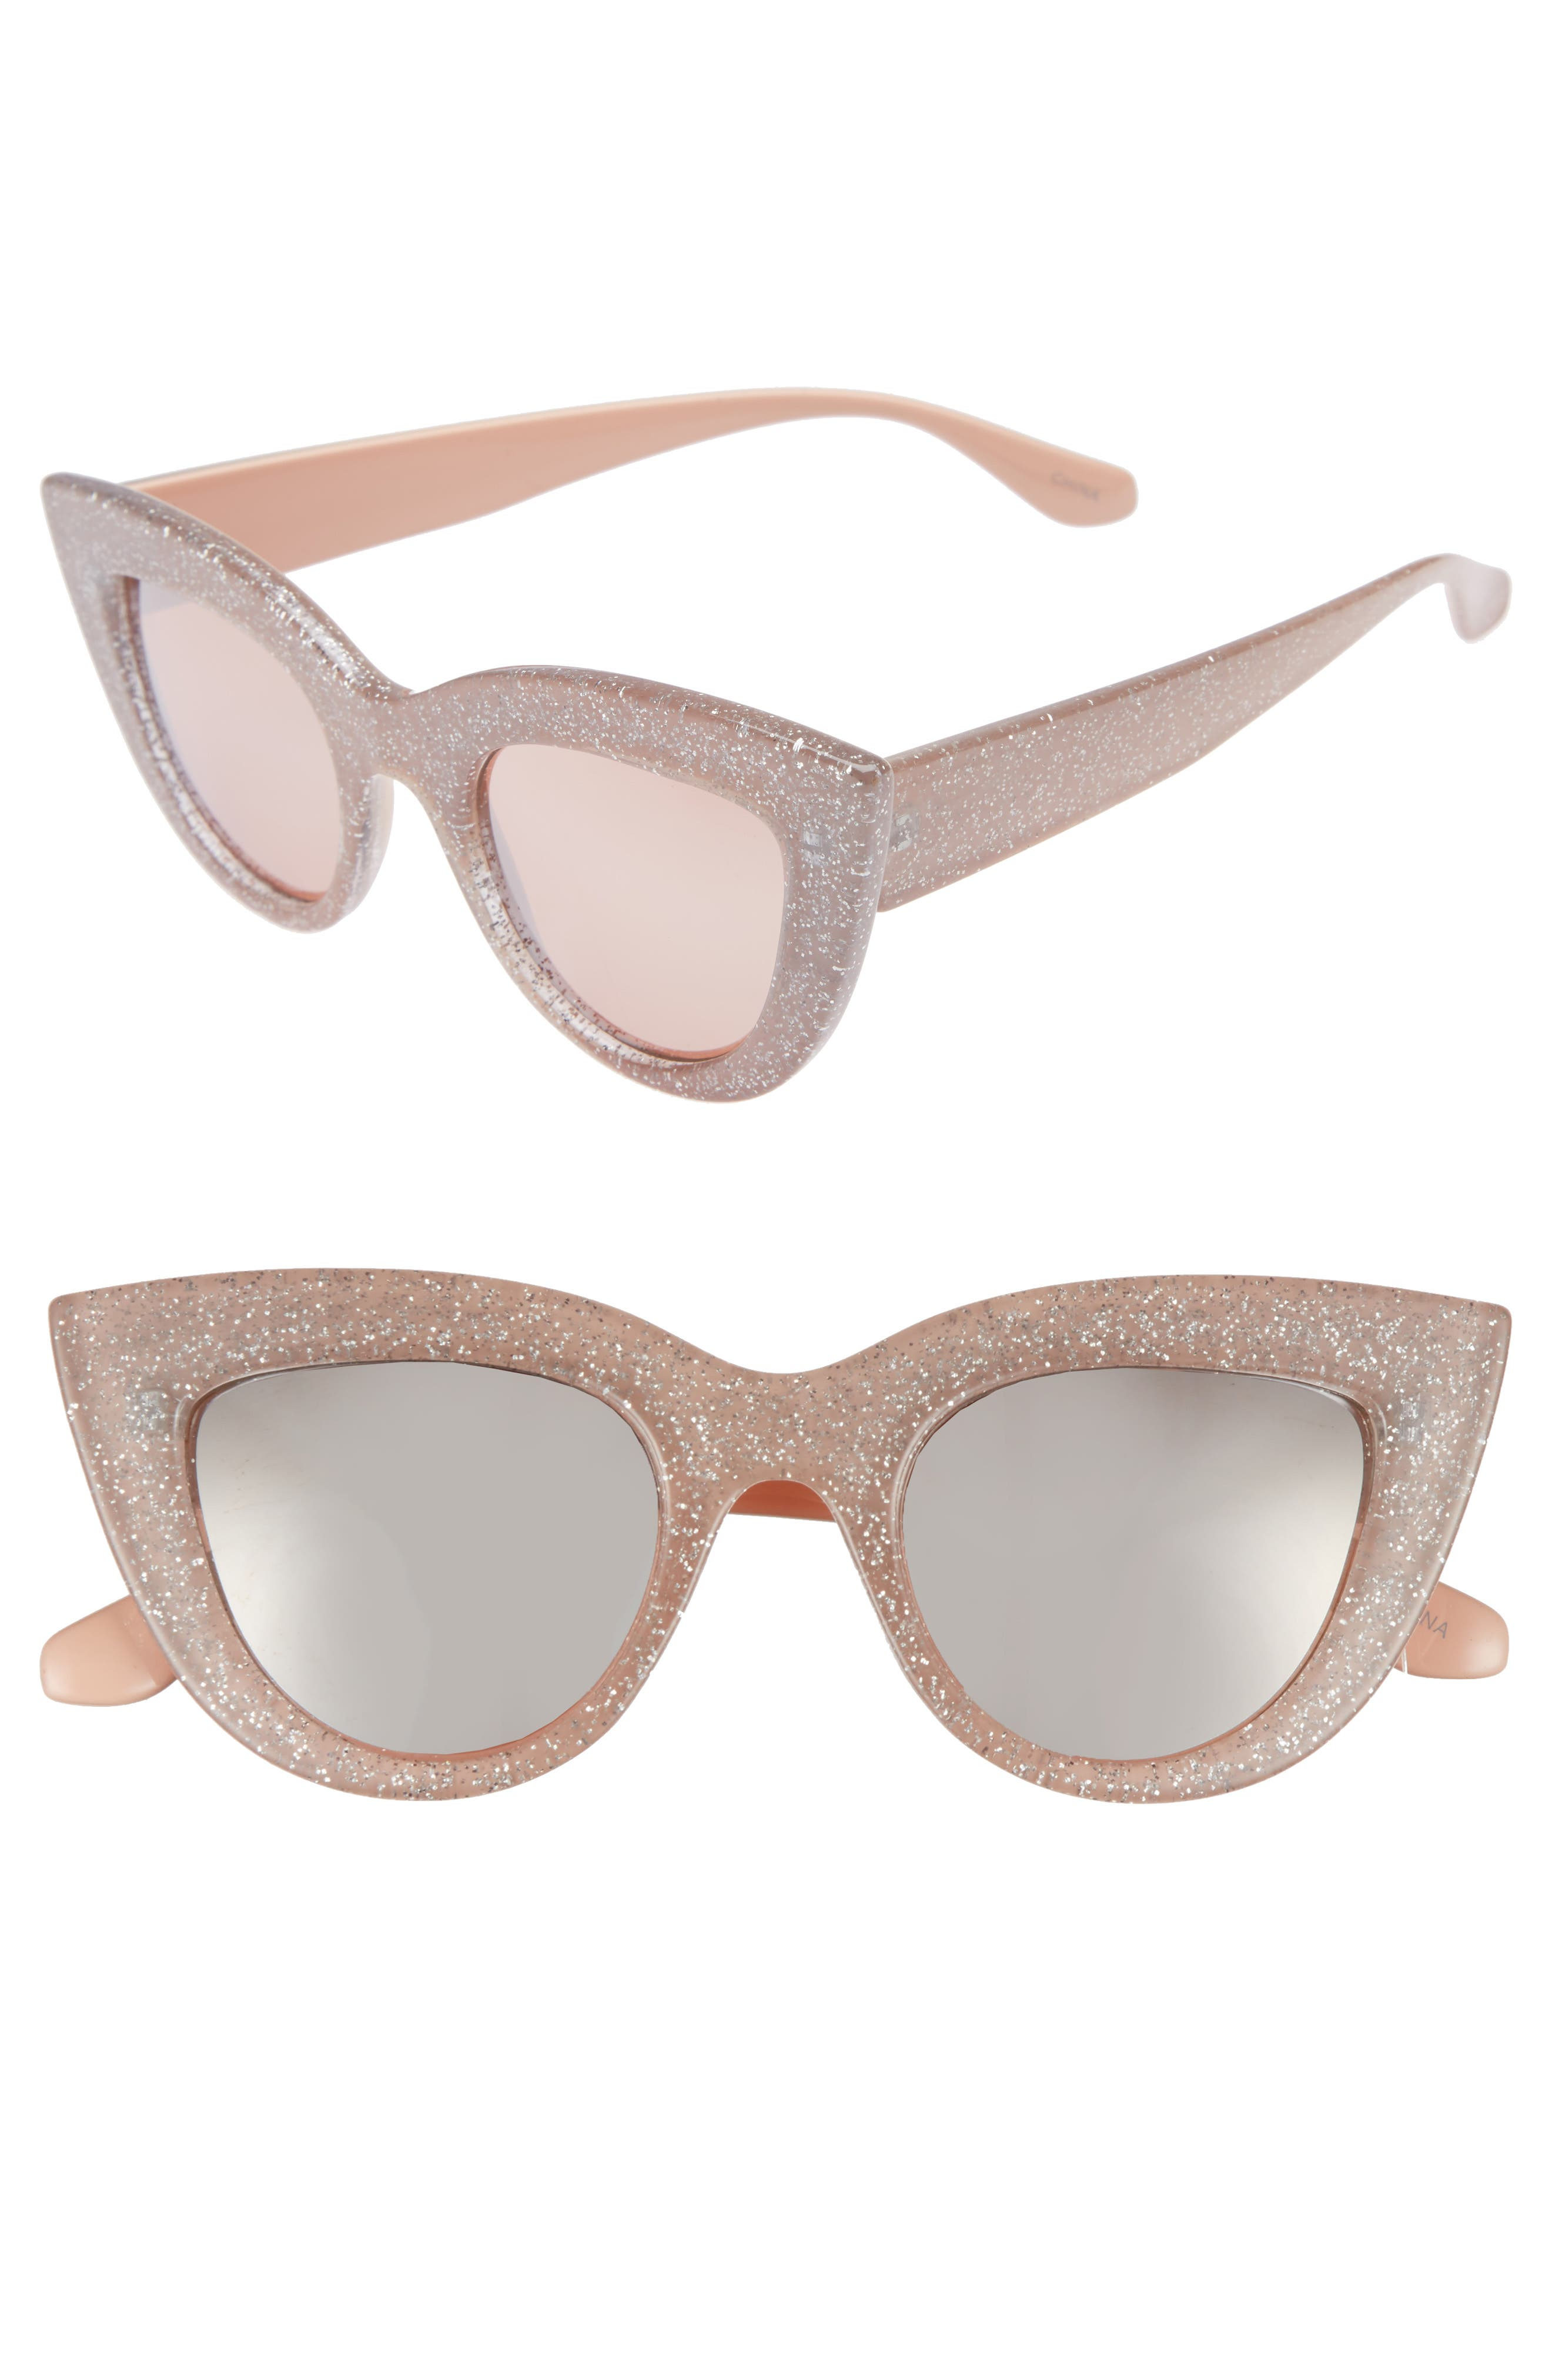 45mm Glitter Cat Eye Sunglasses,                             Main thumbnail 2, color,